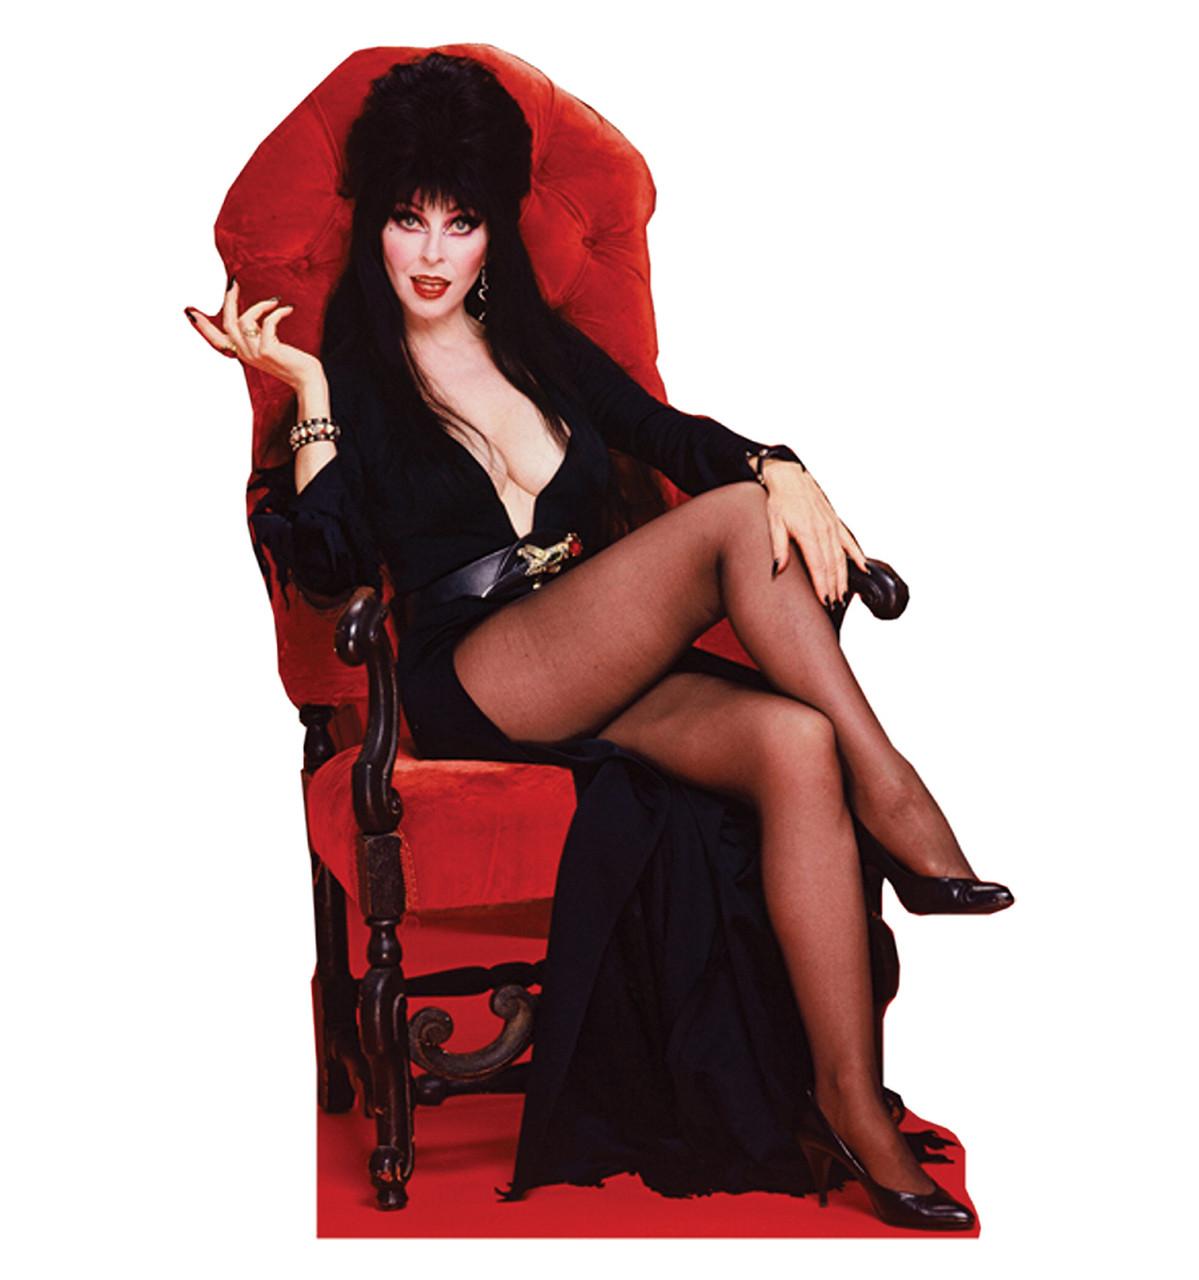 Life-size Elvira Chair - Talking Cardboard Standup |Cardboard Cutout